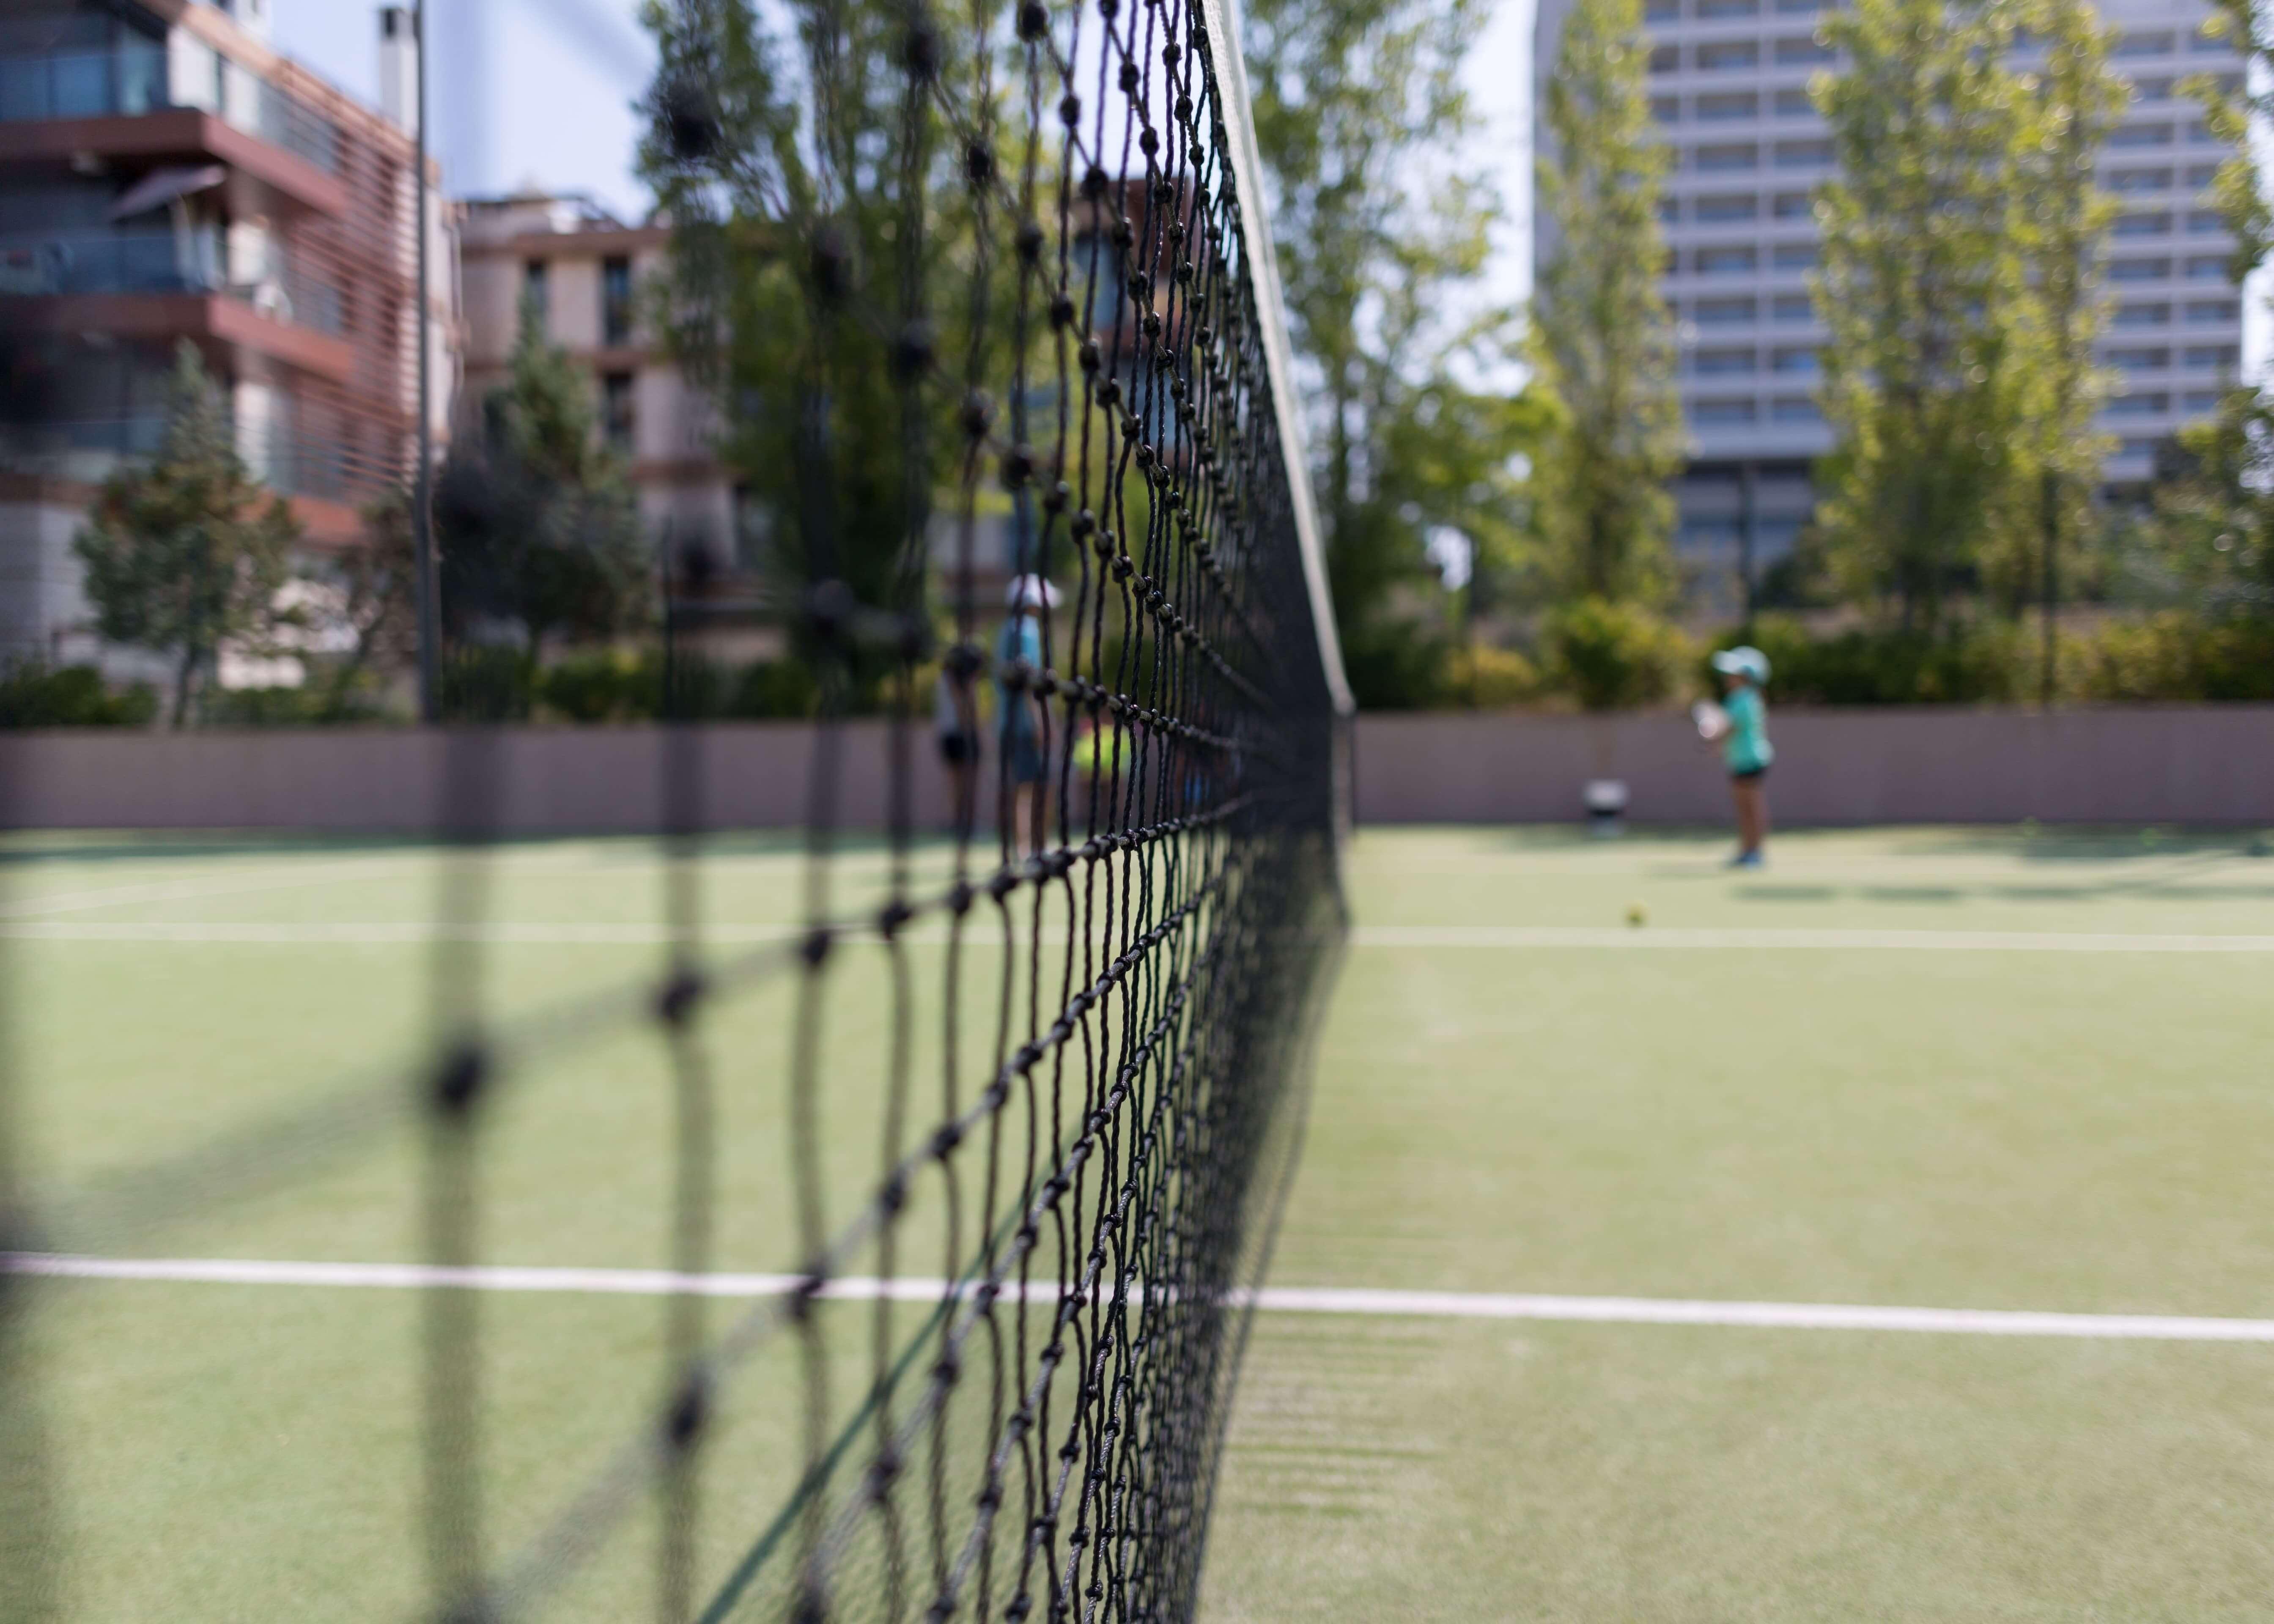 racket club